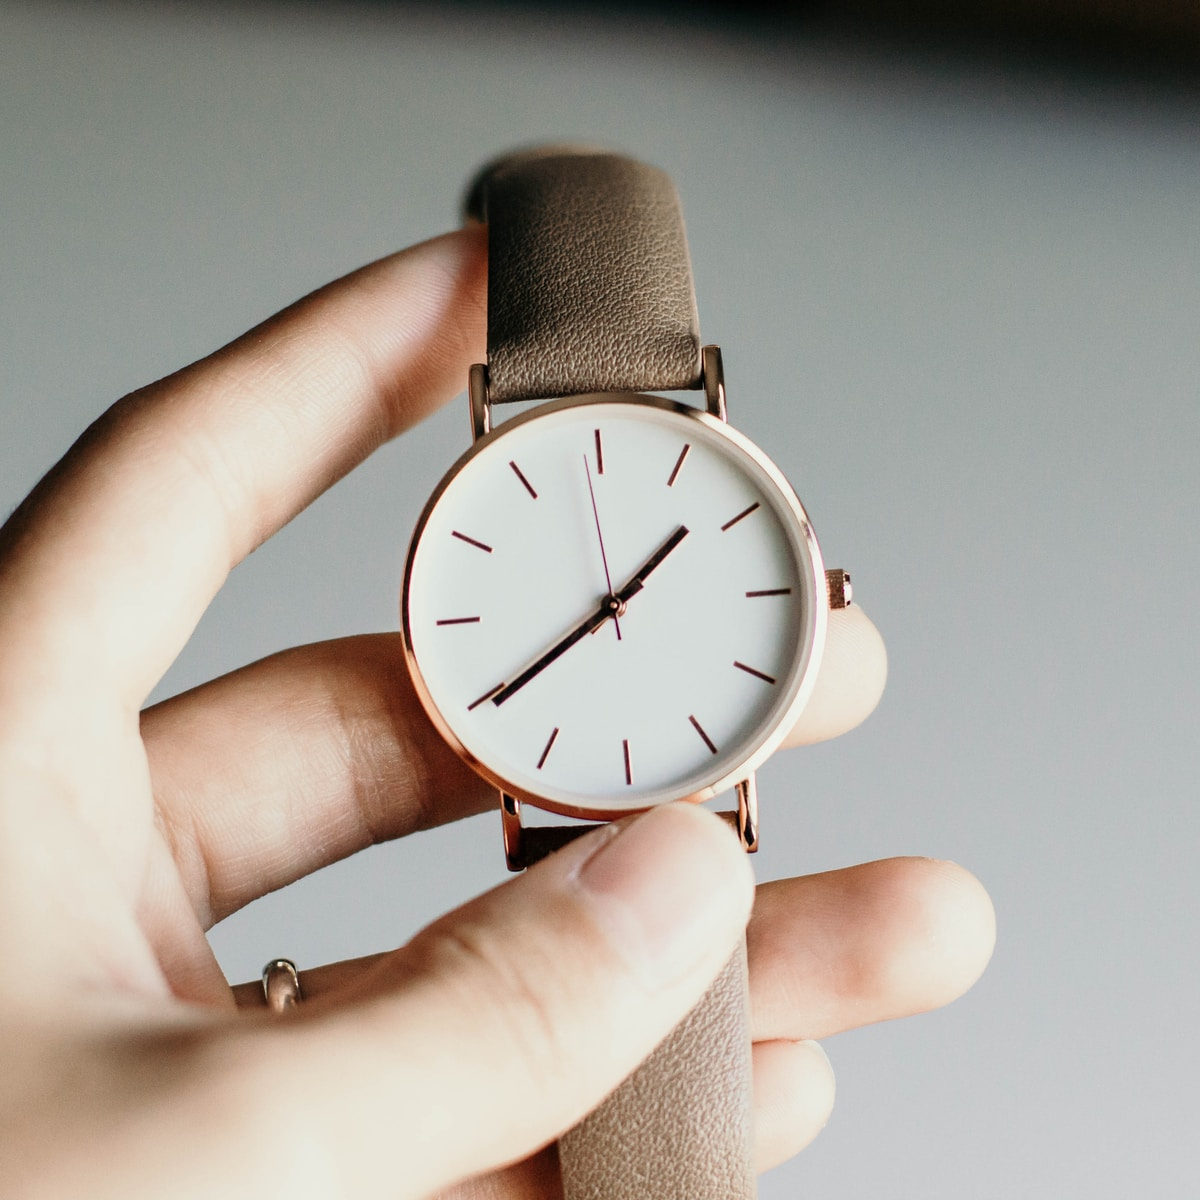 apofenia, person holding analog watch